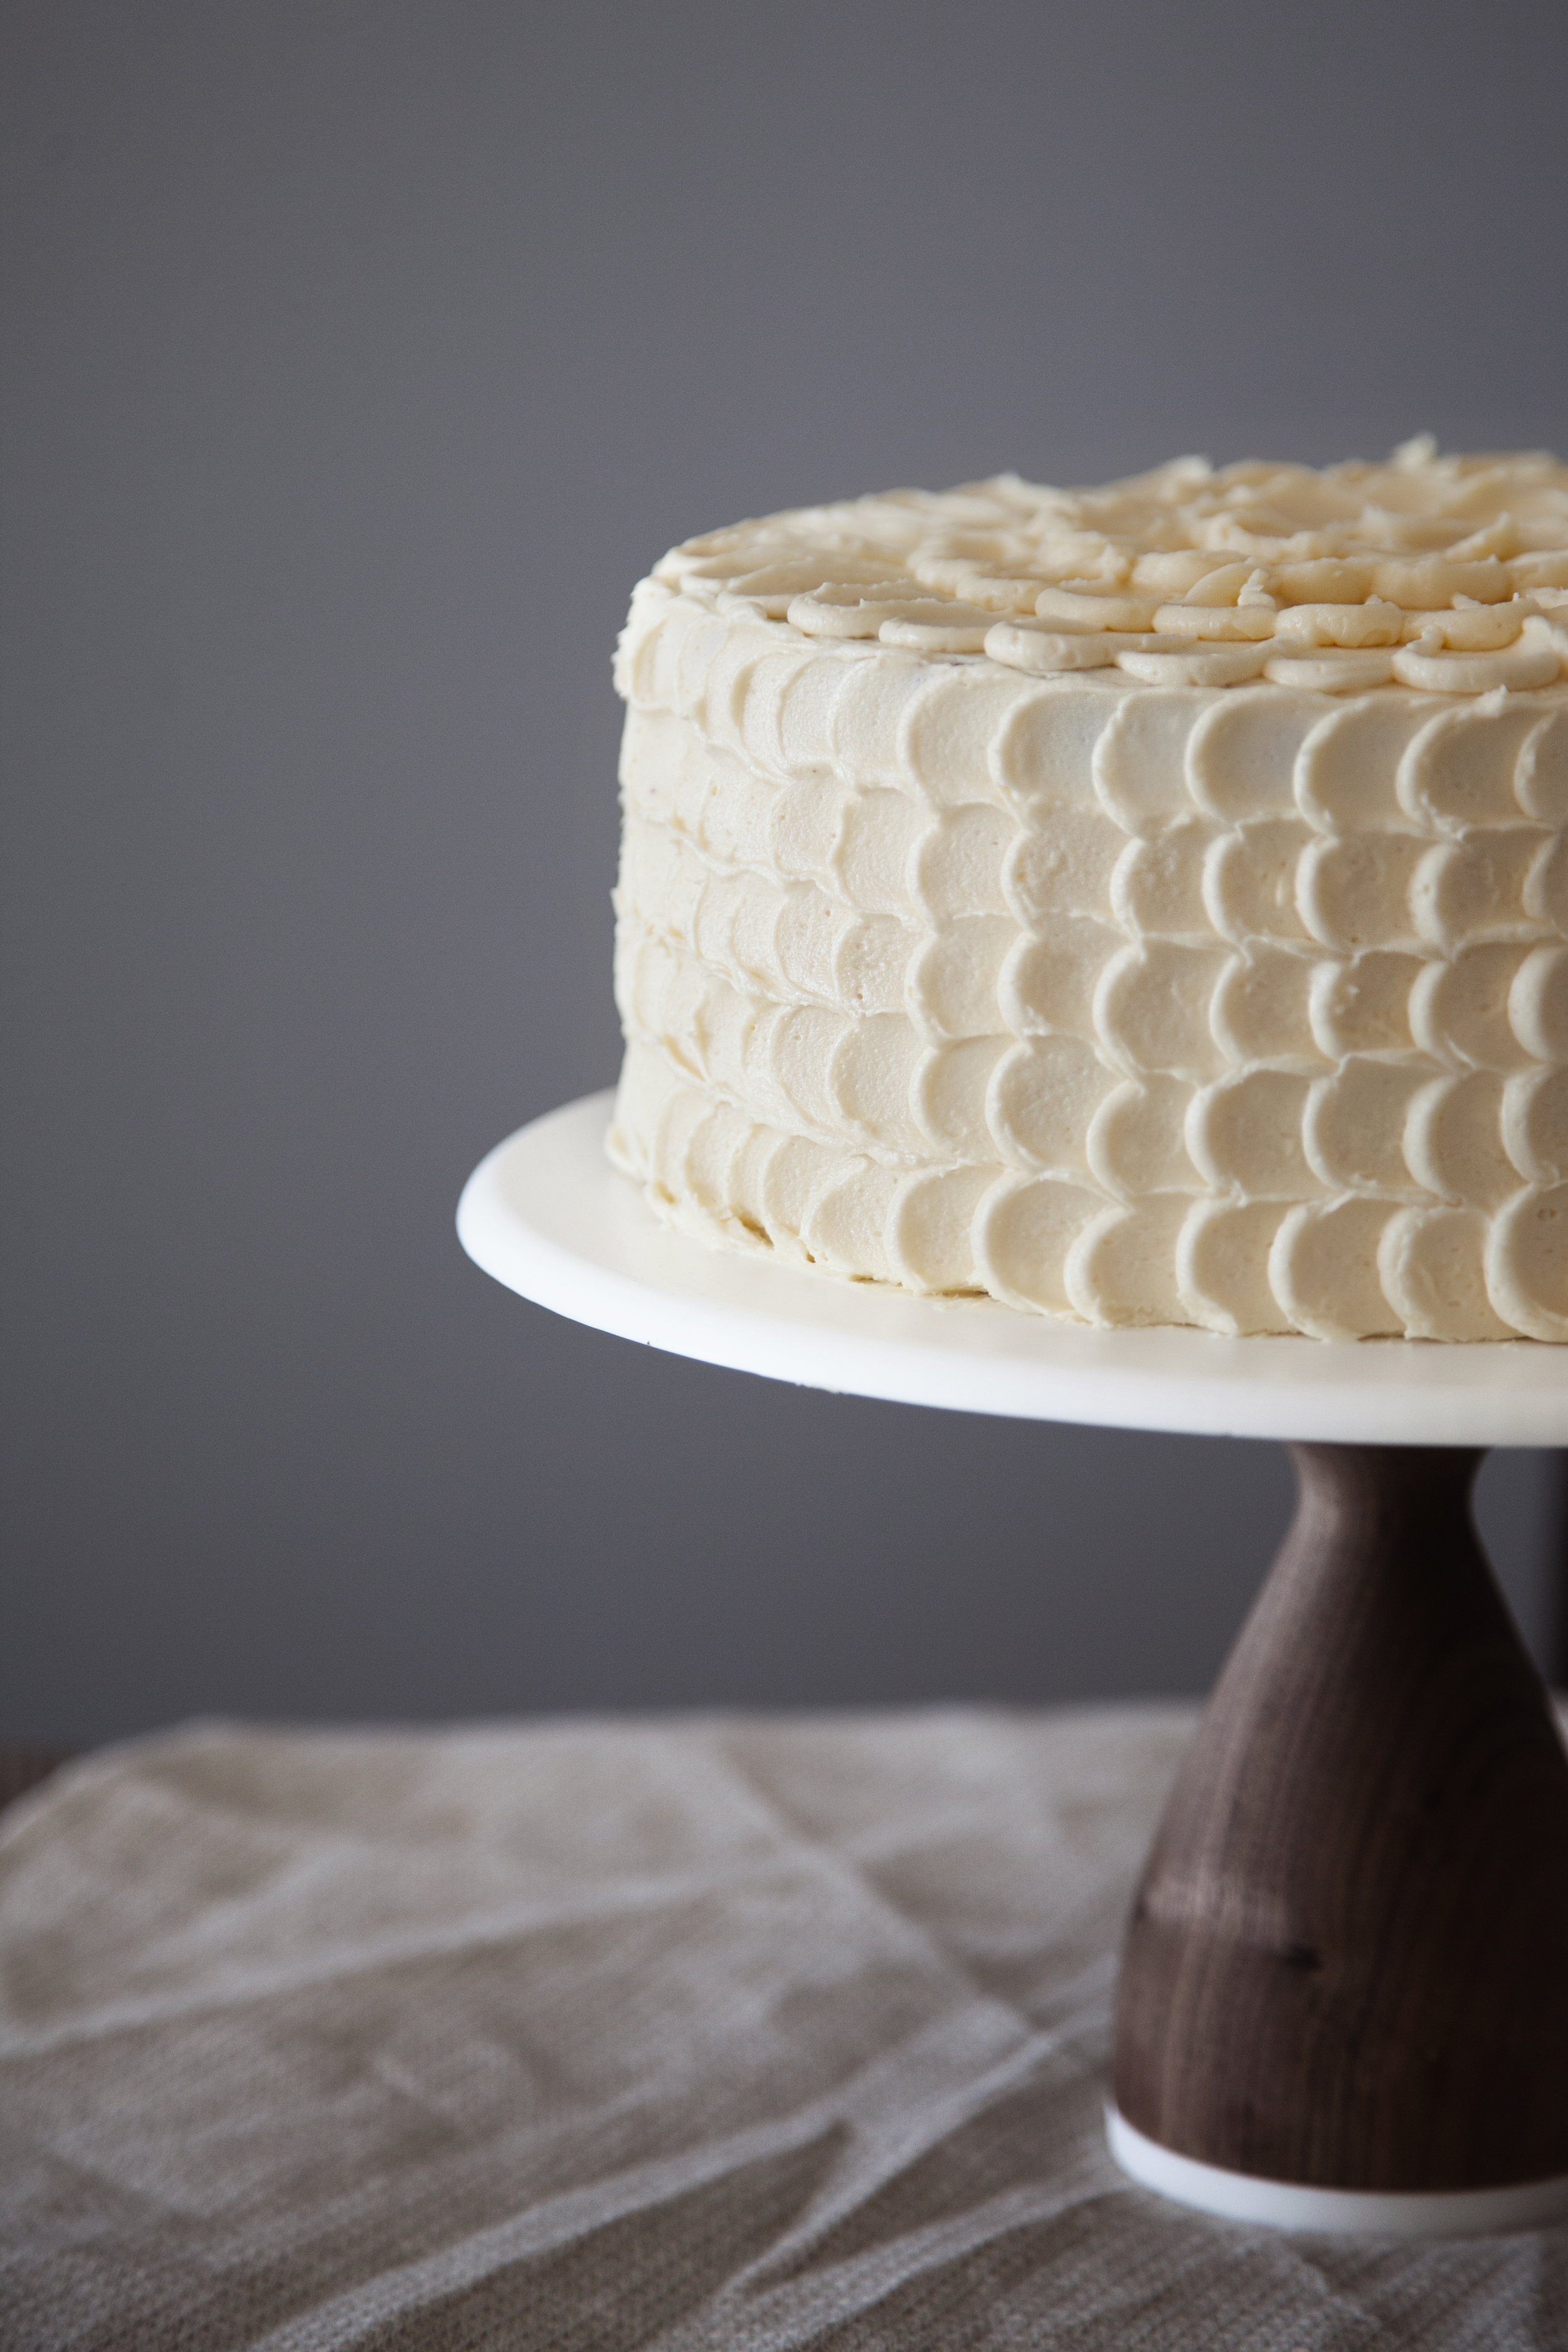 dolche cake iii.jpg